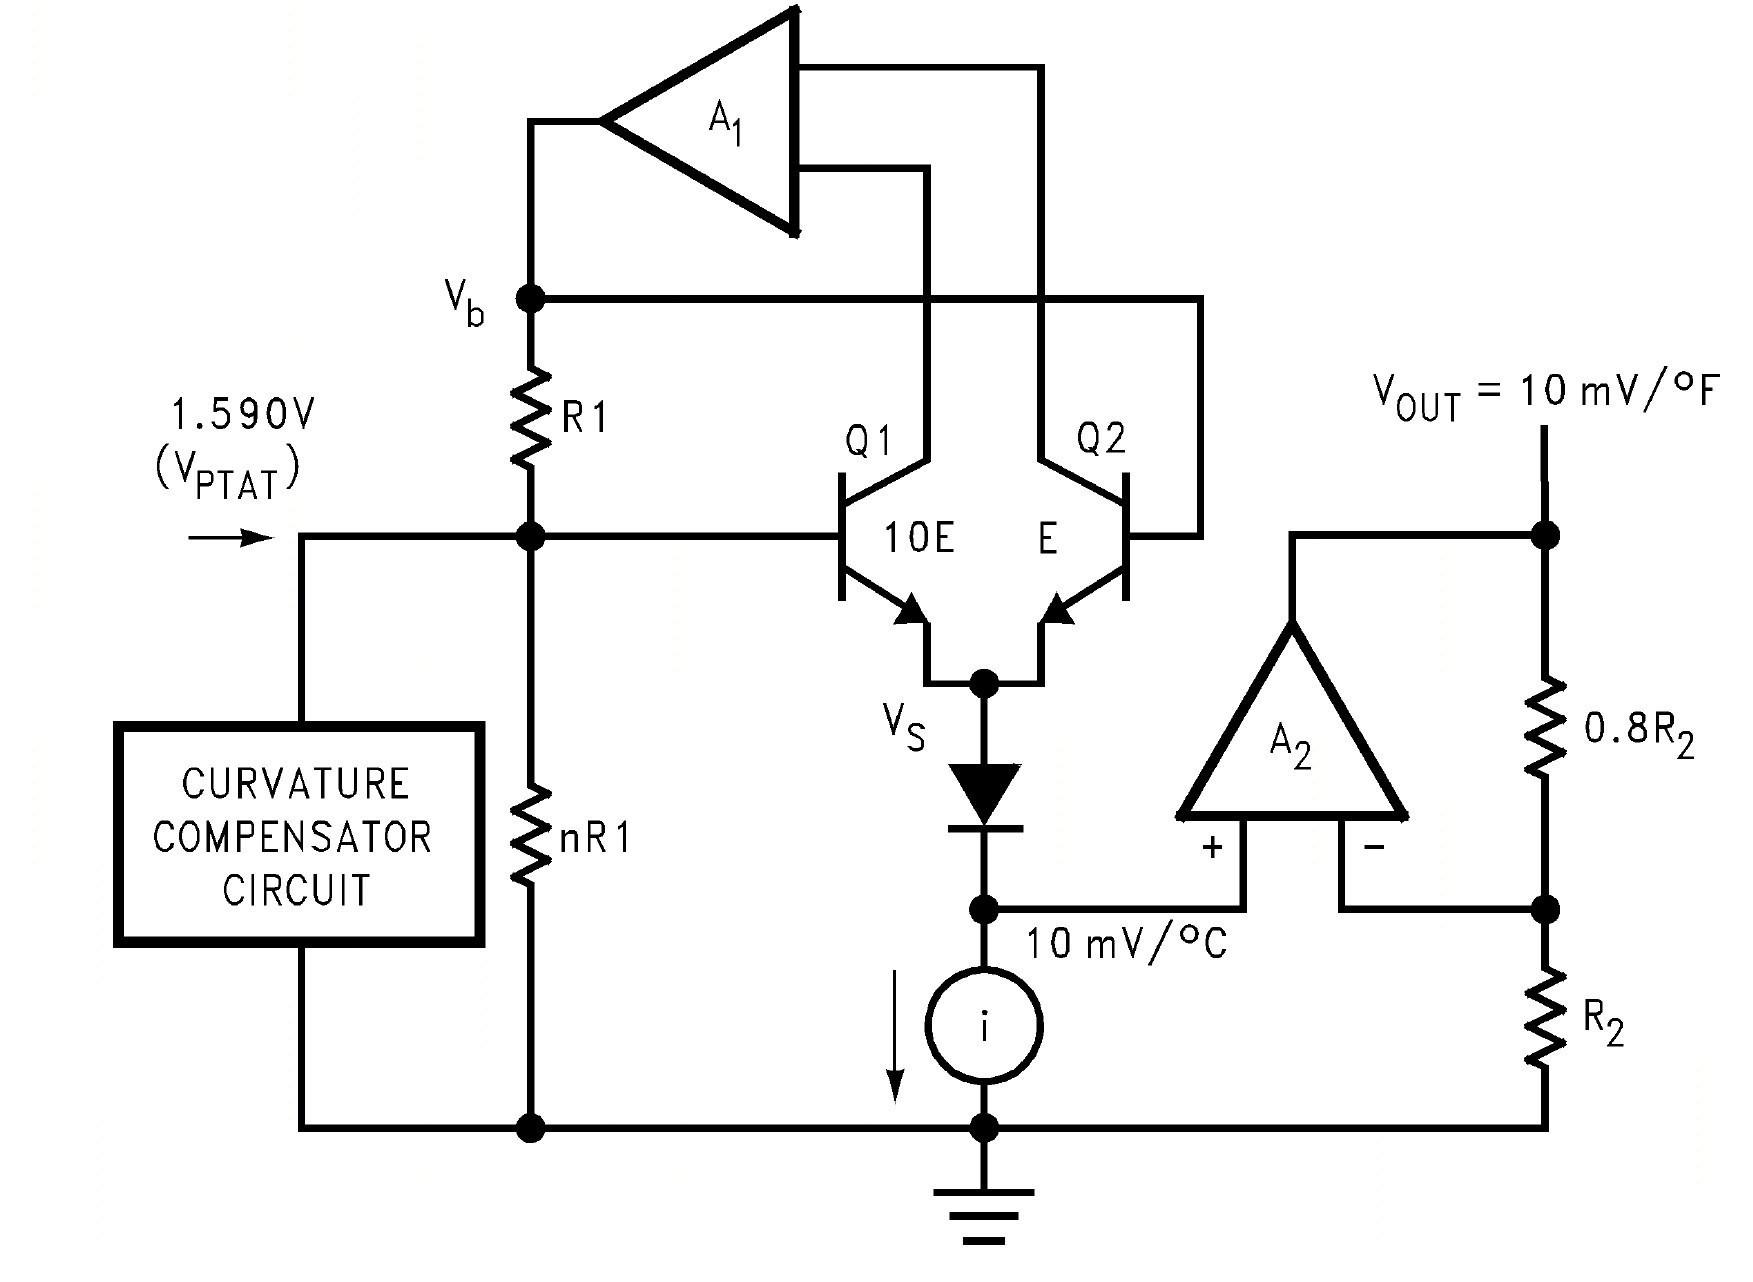 Diagram A Simple Circuit Inspirational Simple Circuits Diagram New Fresh Basic Wiring Diagram Diagram